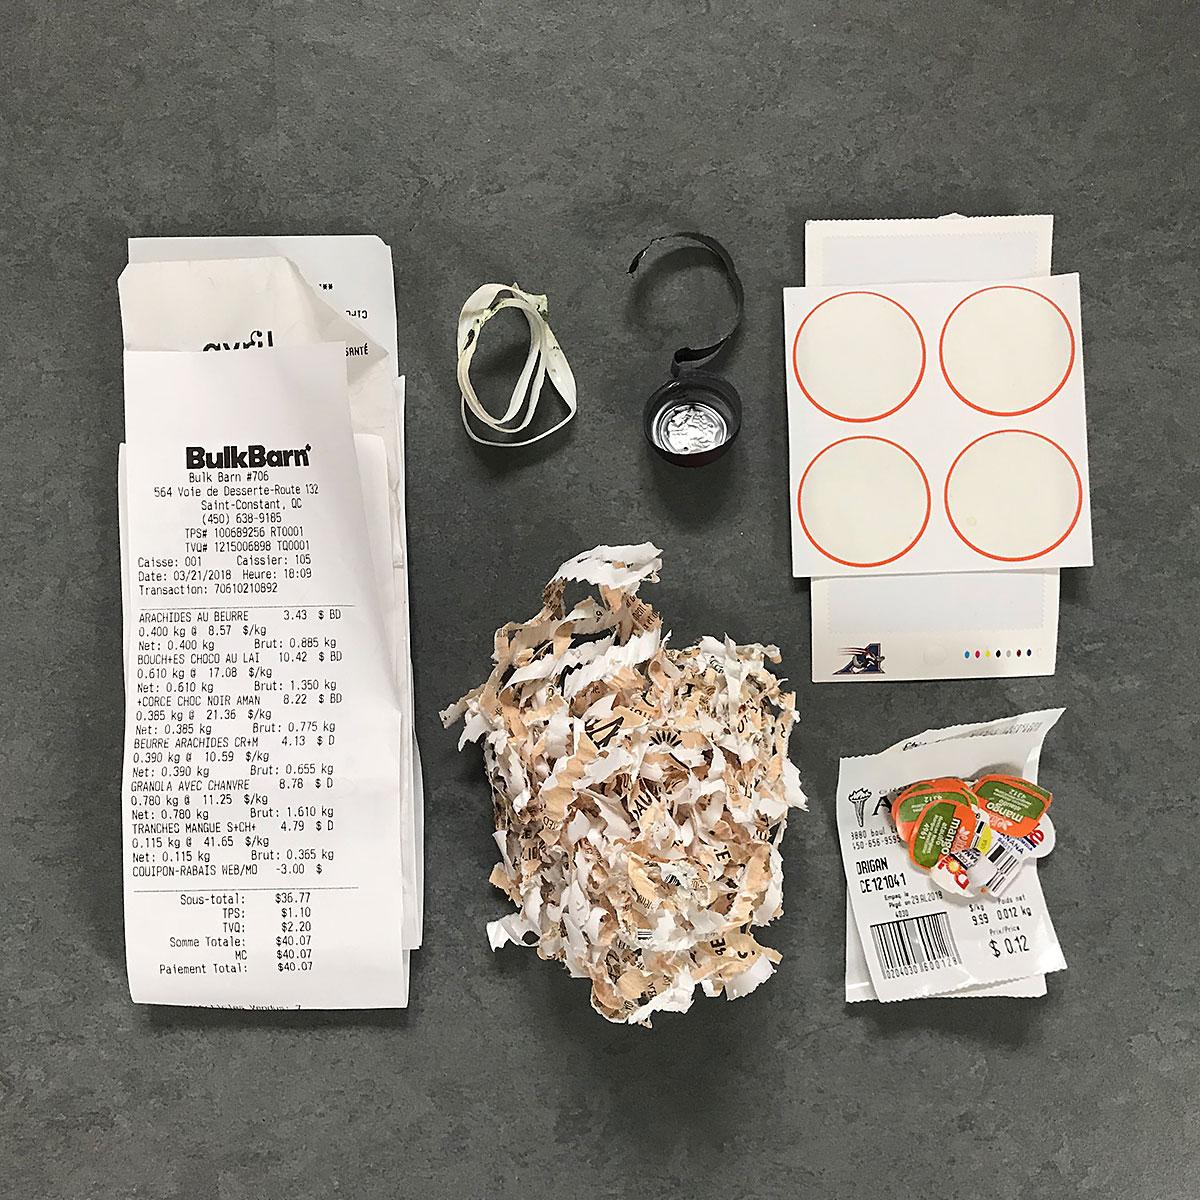 tiny trash can week 17 trash contents